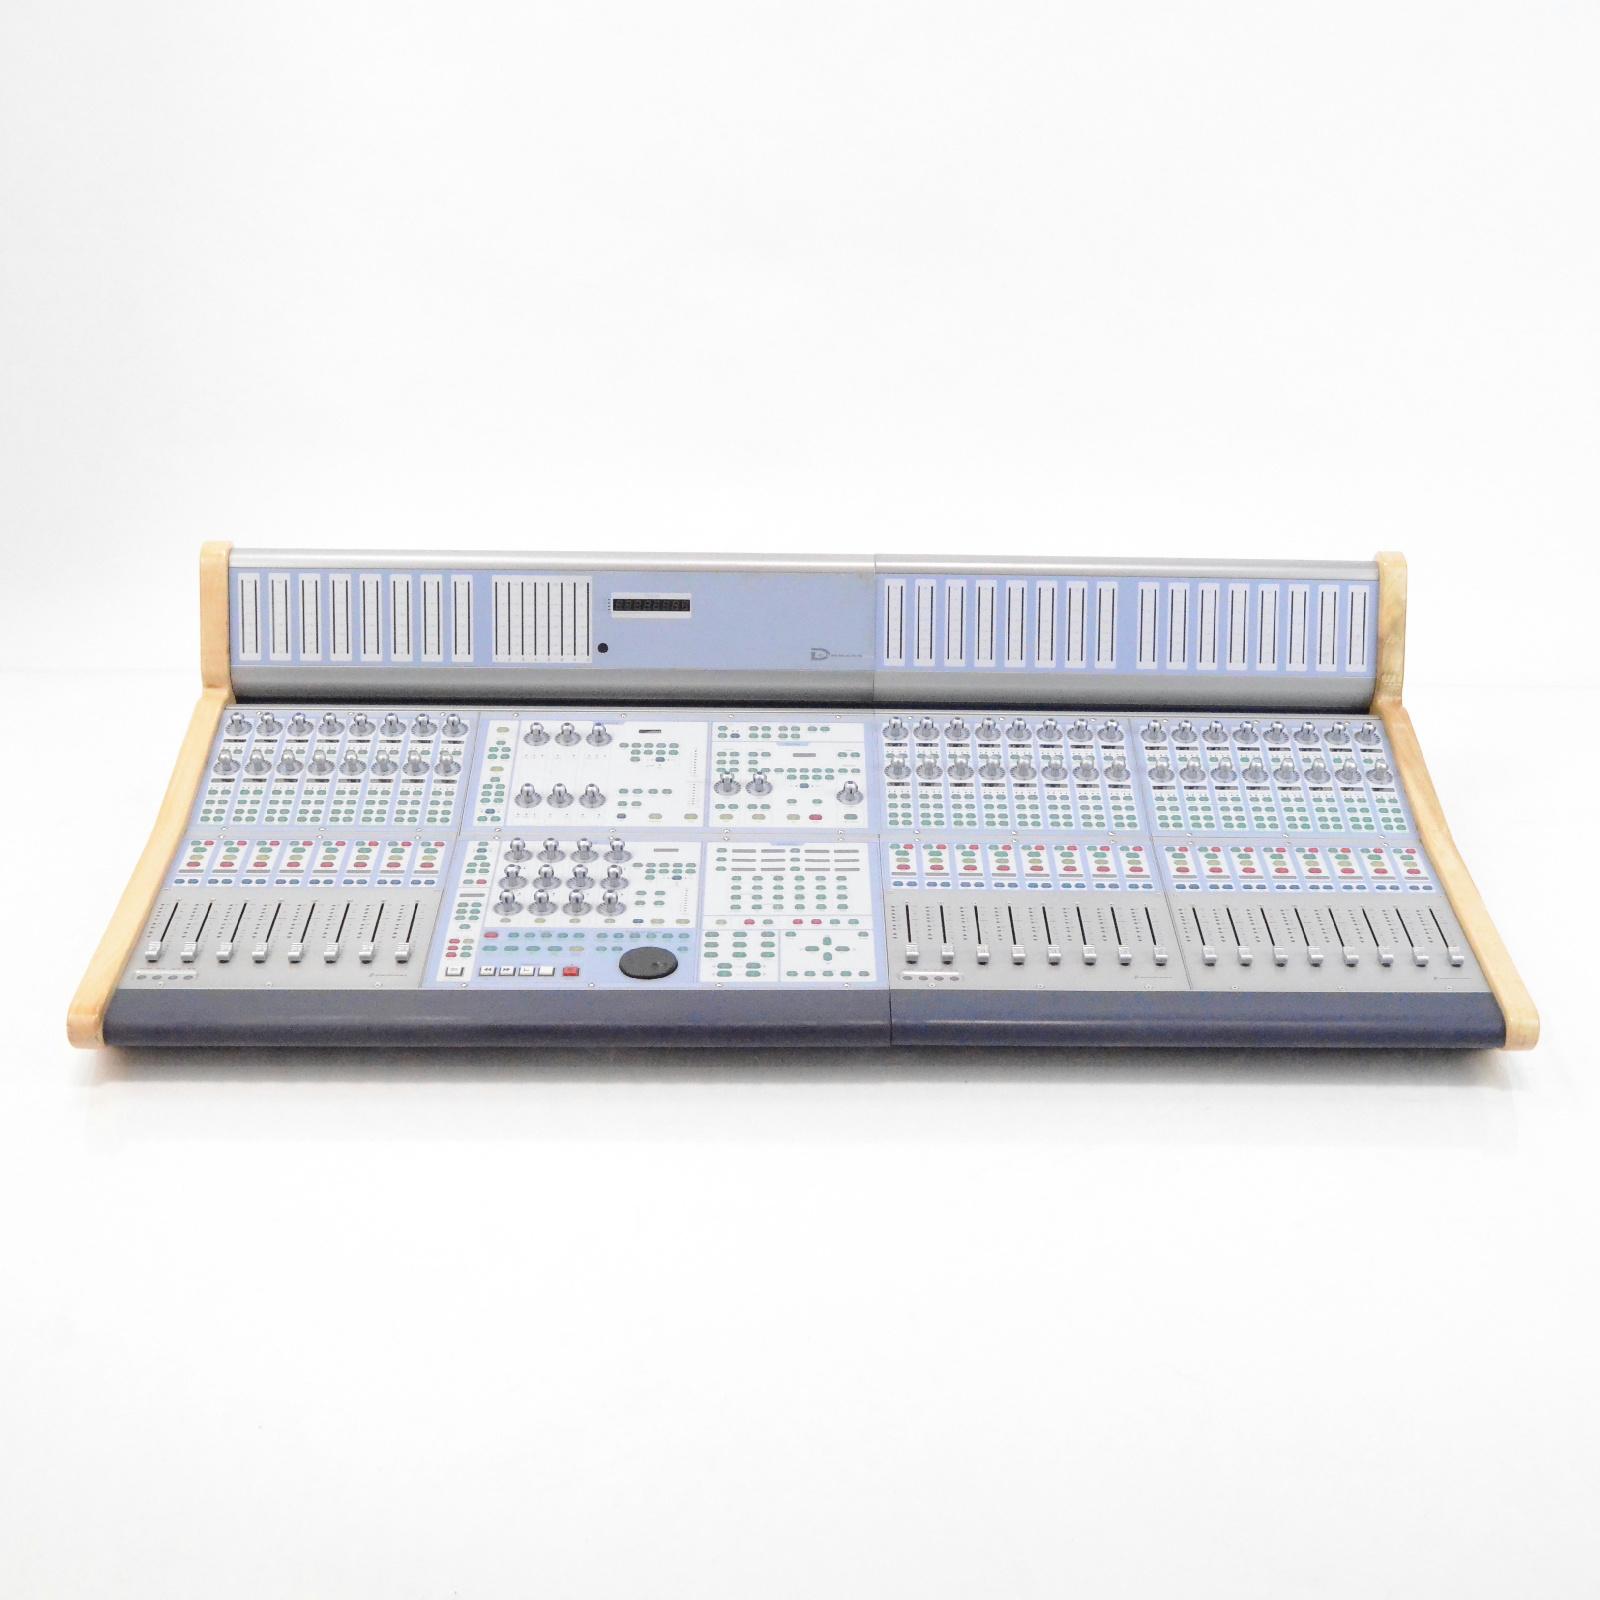 Digidesign D-Command Pro Tools HD Control Surface Console w/ Custom Wood #32943